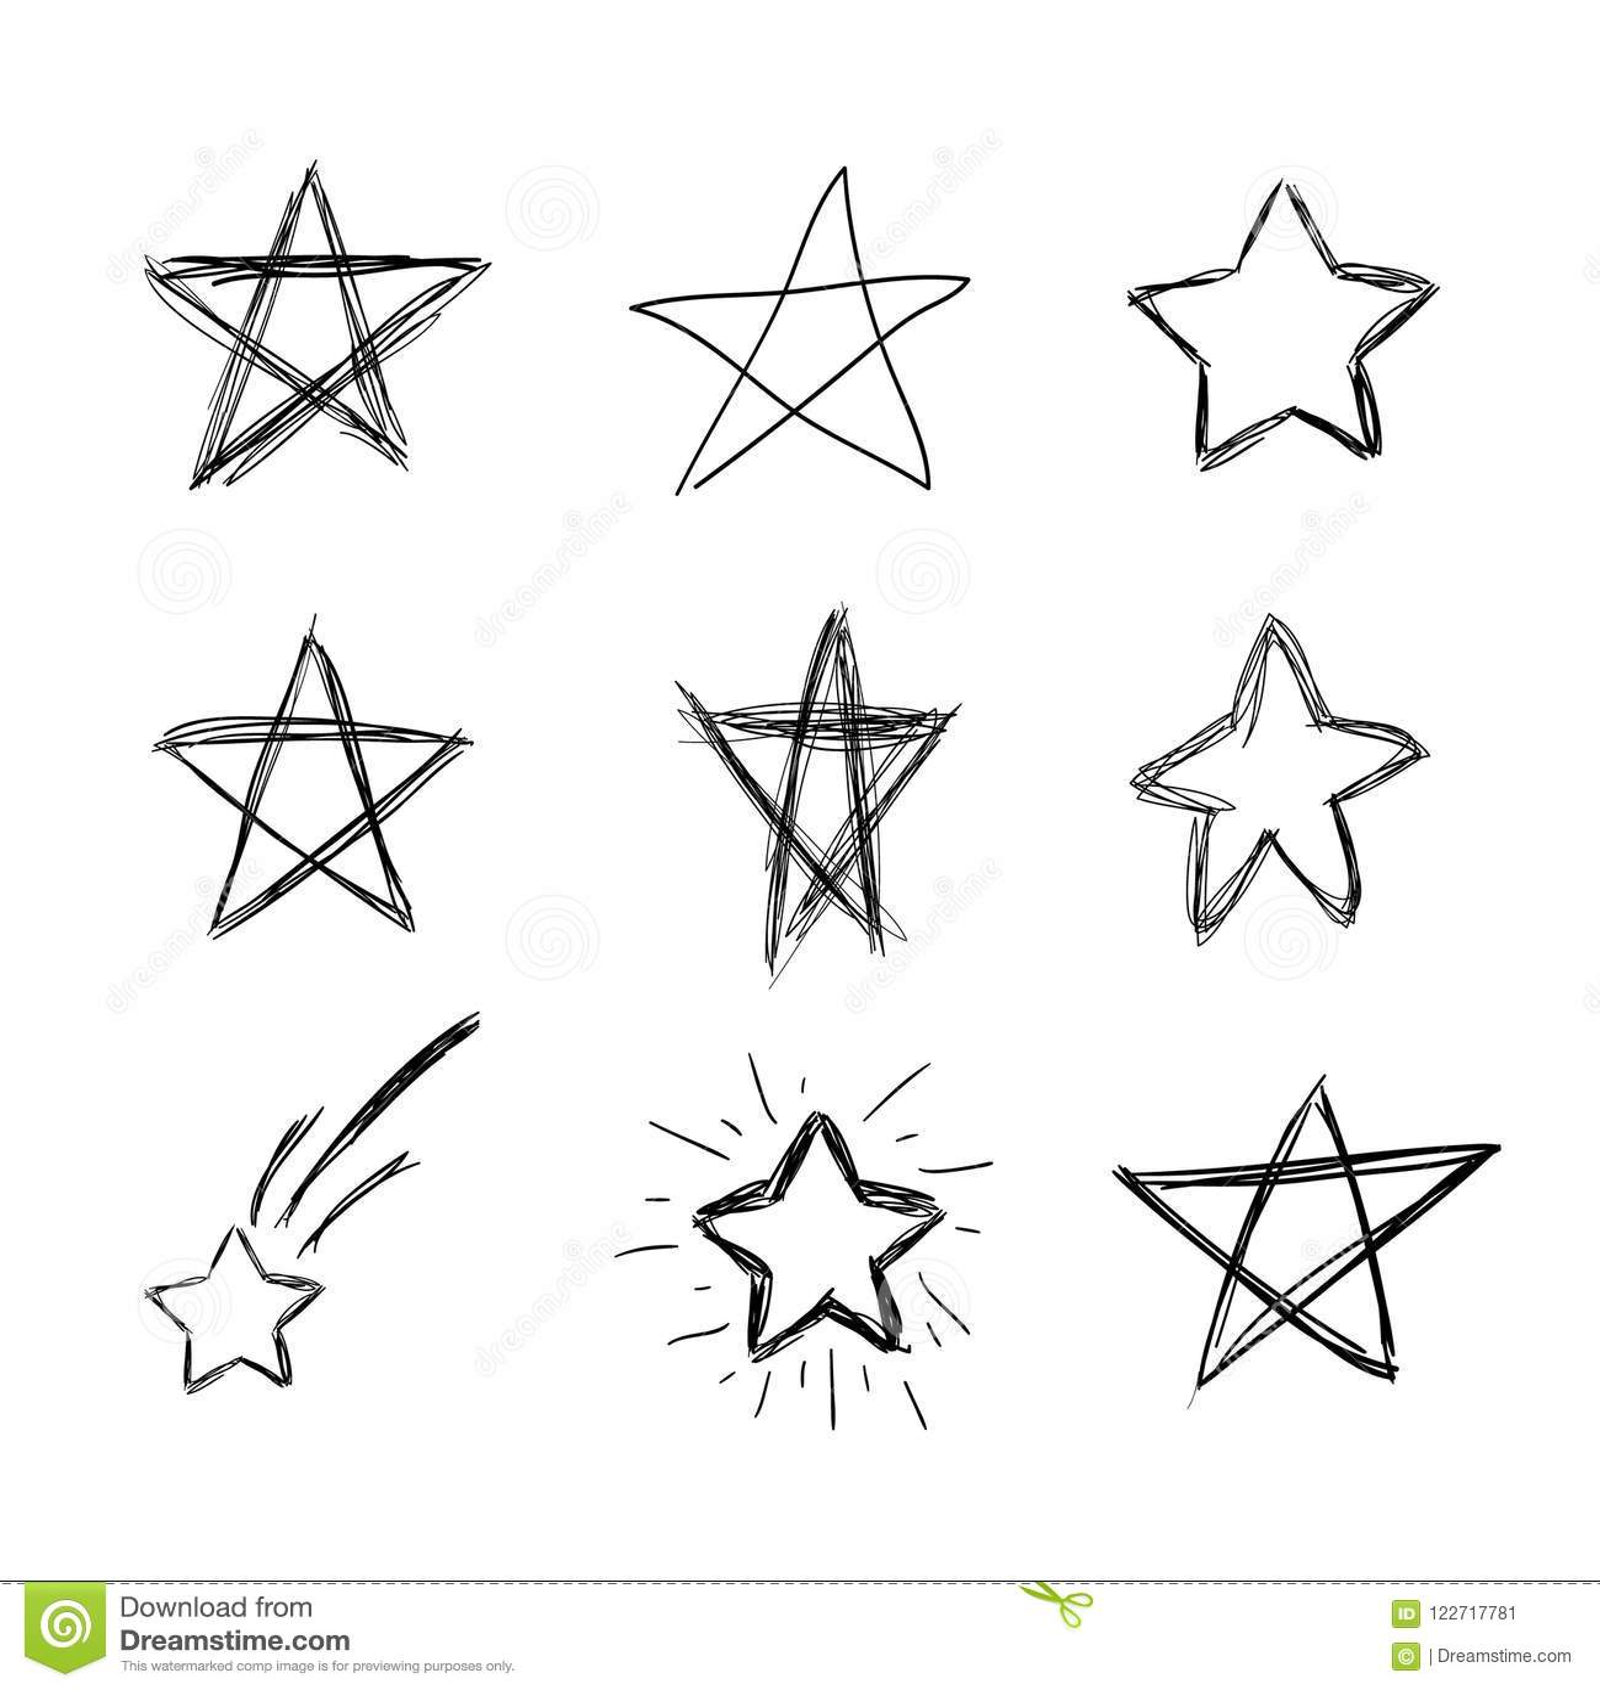 Vector hand drawn doodle stars scribble drawings black